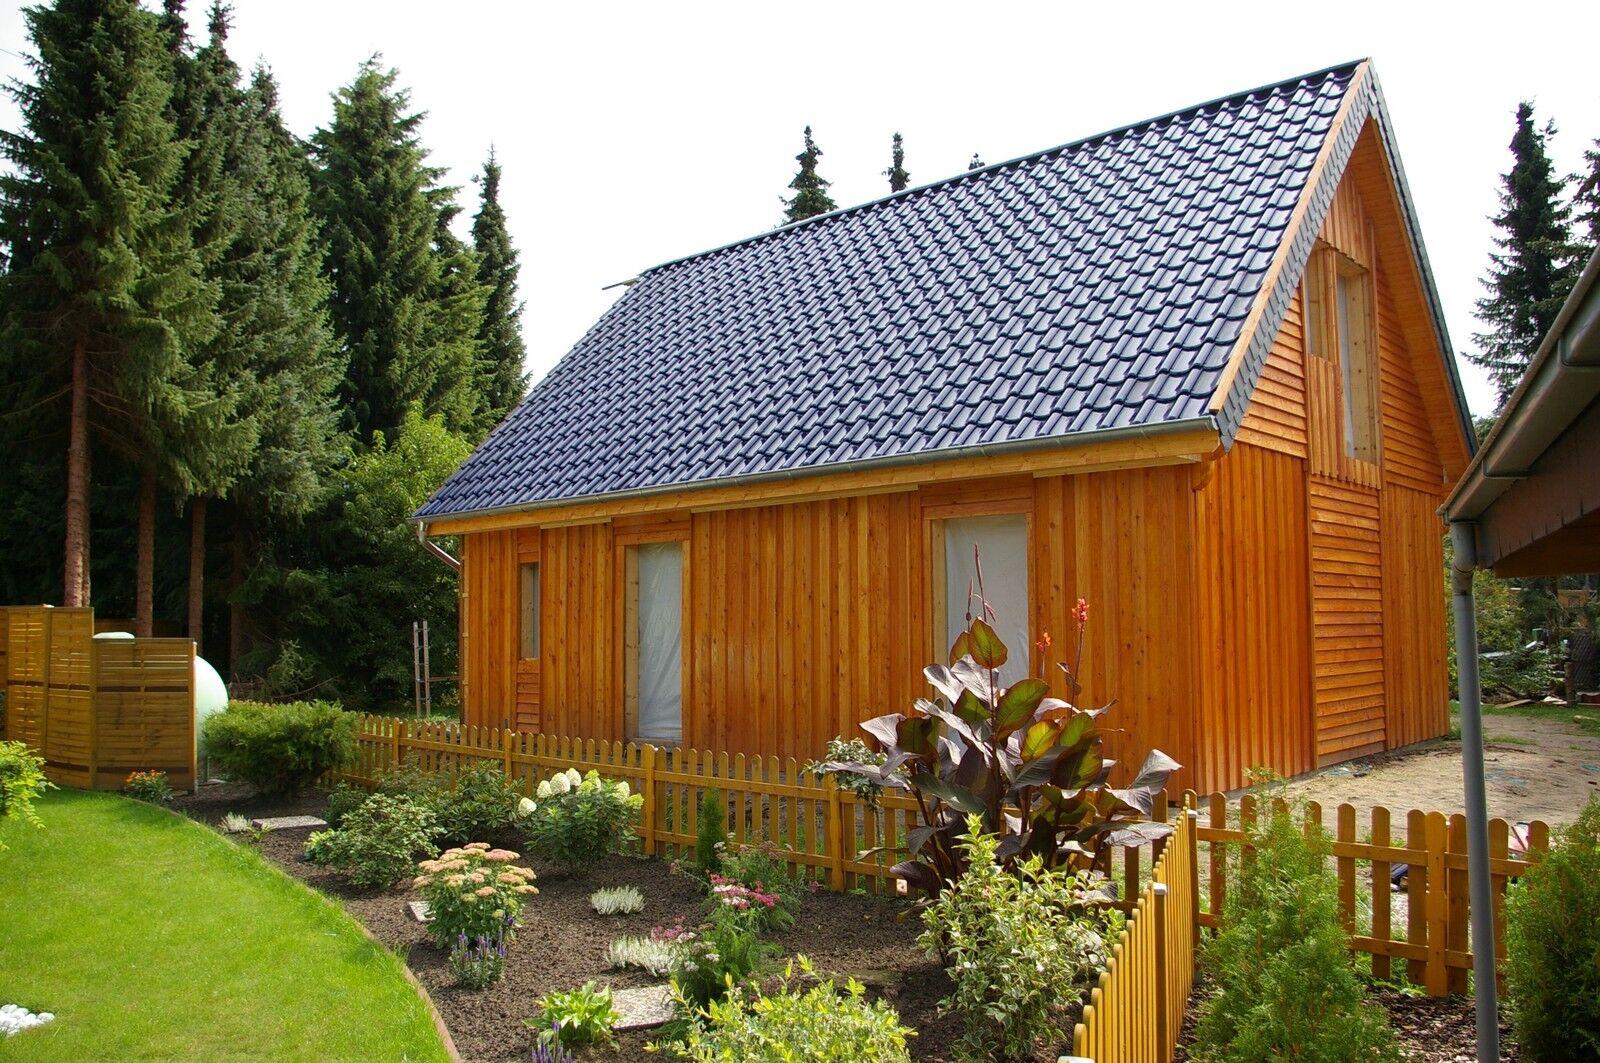 Tiny House Rohbau mit Montage Fertighaus 7,00 x 10,00 Meter